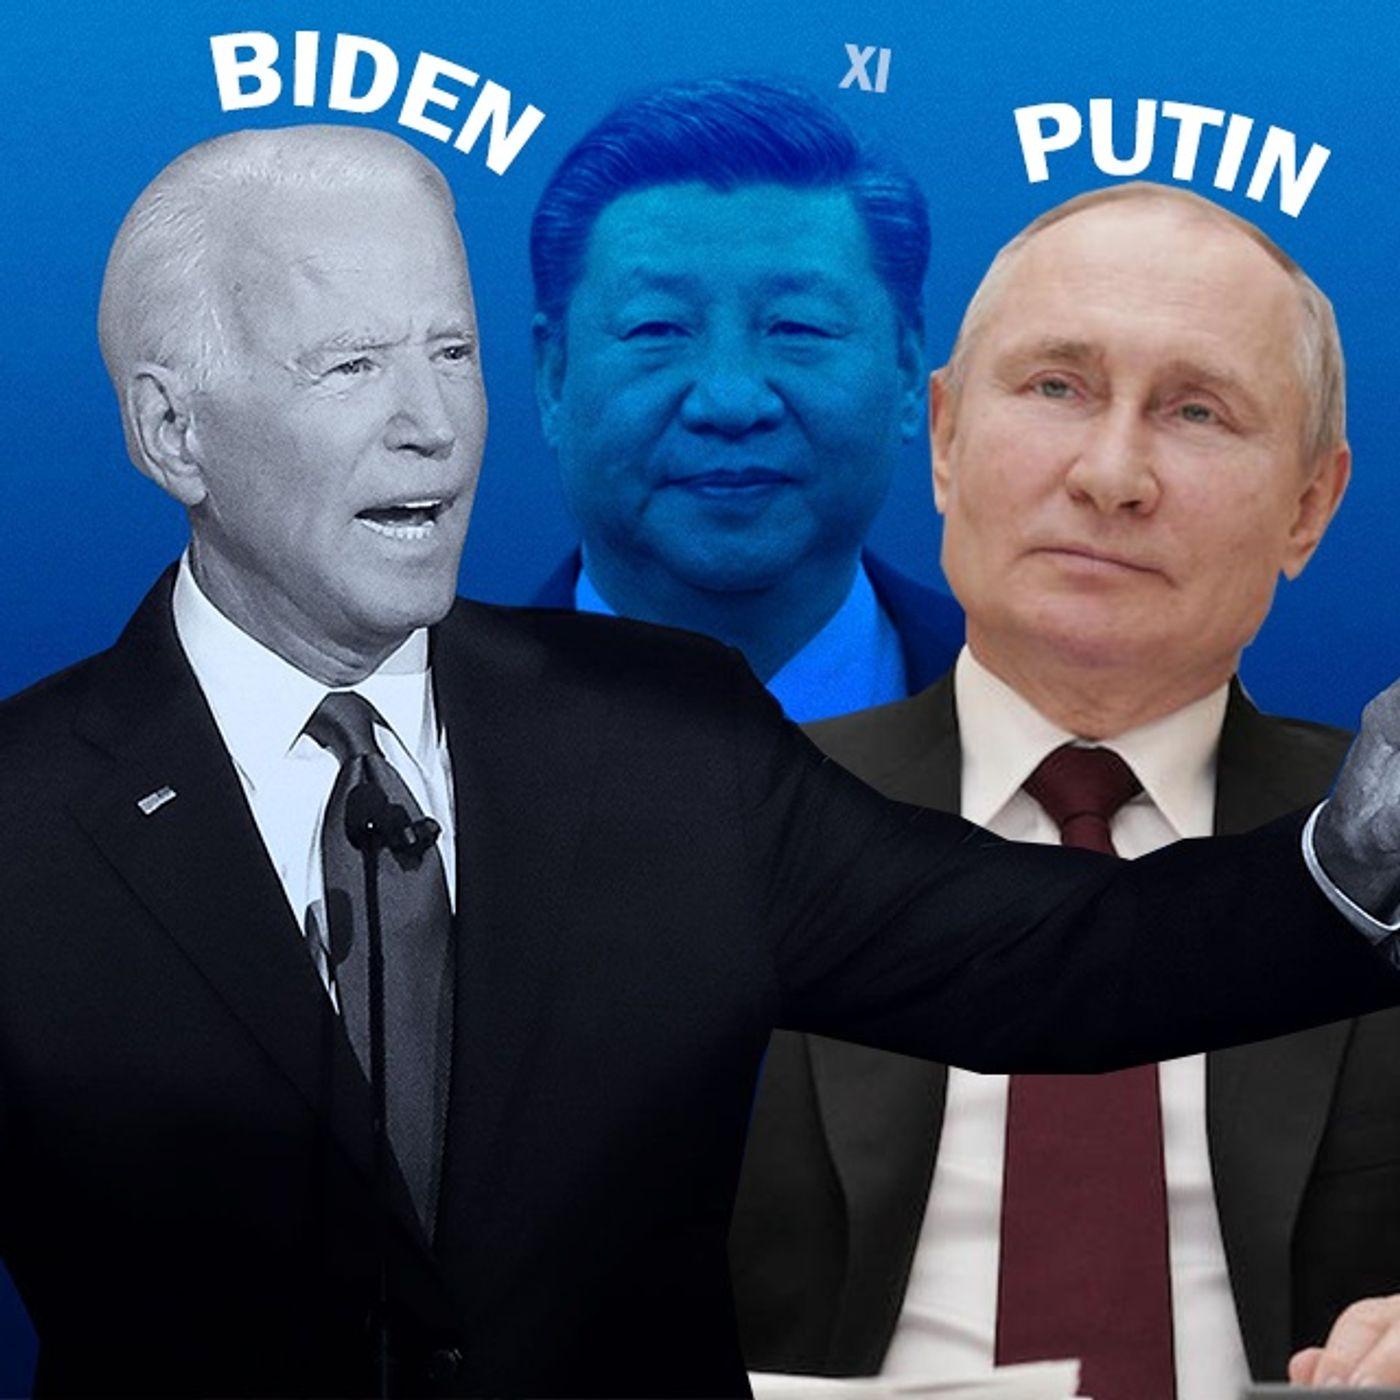 Scontro BIDEN-PUTIN: tra i due litiganti, Xi Jinping vince